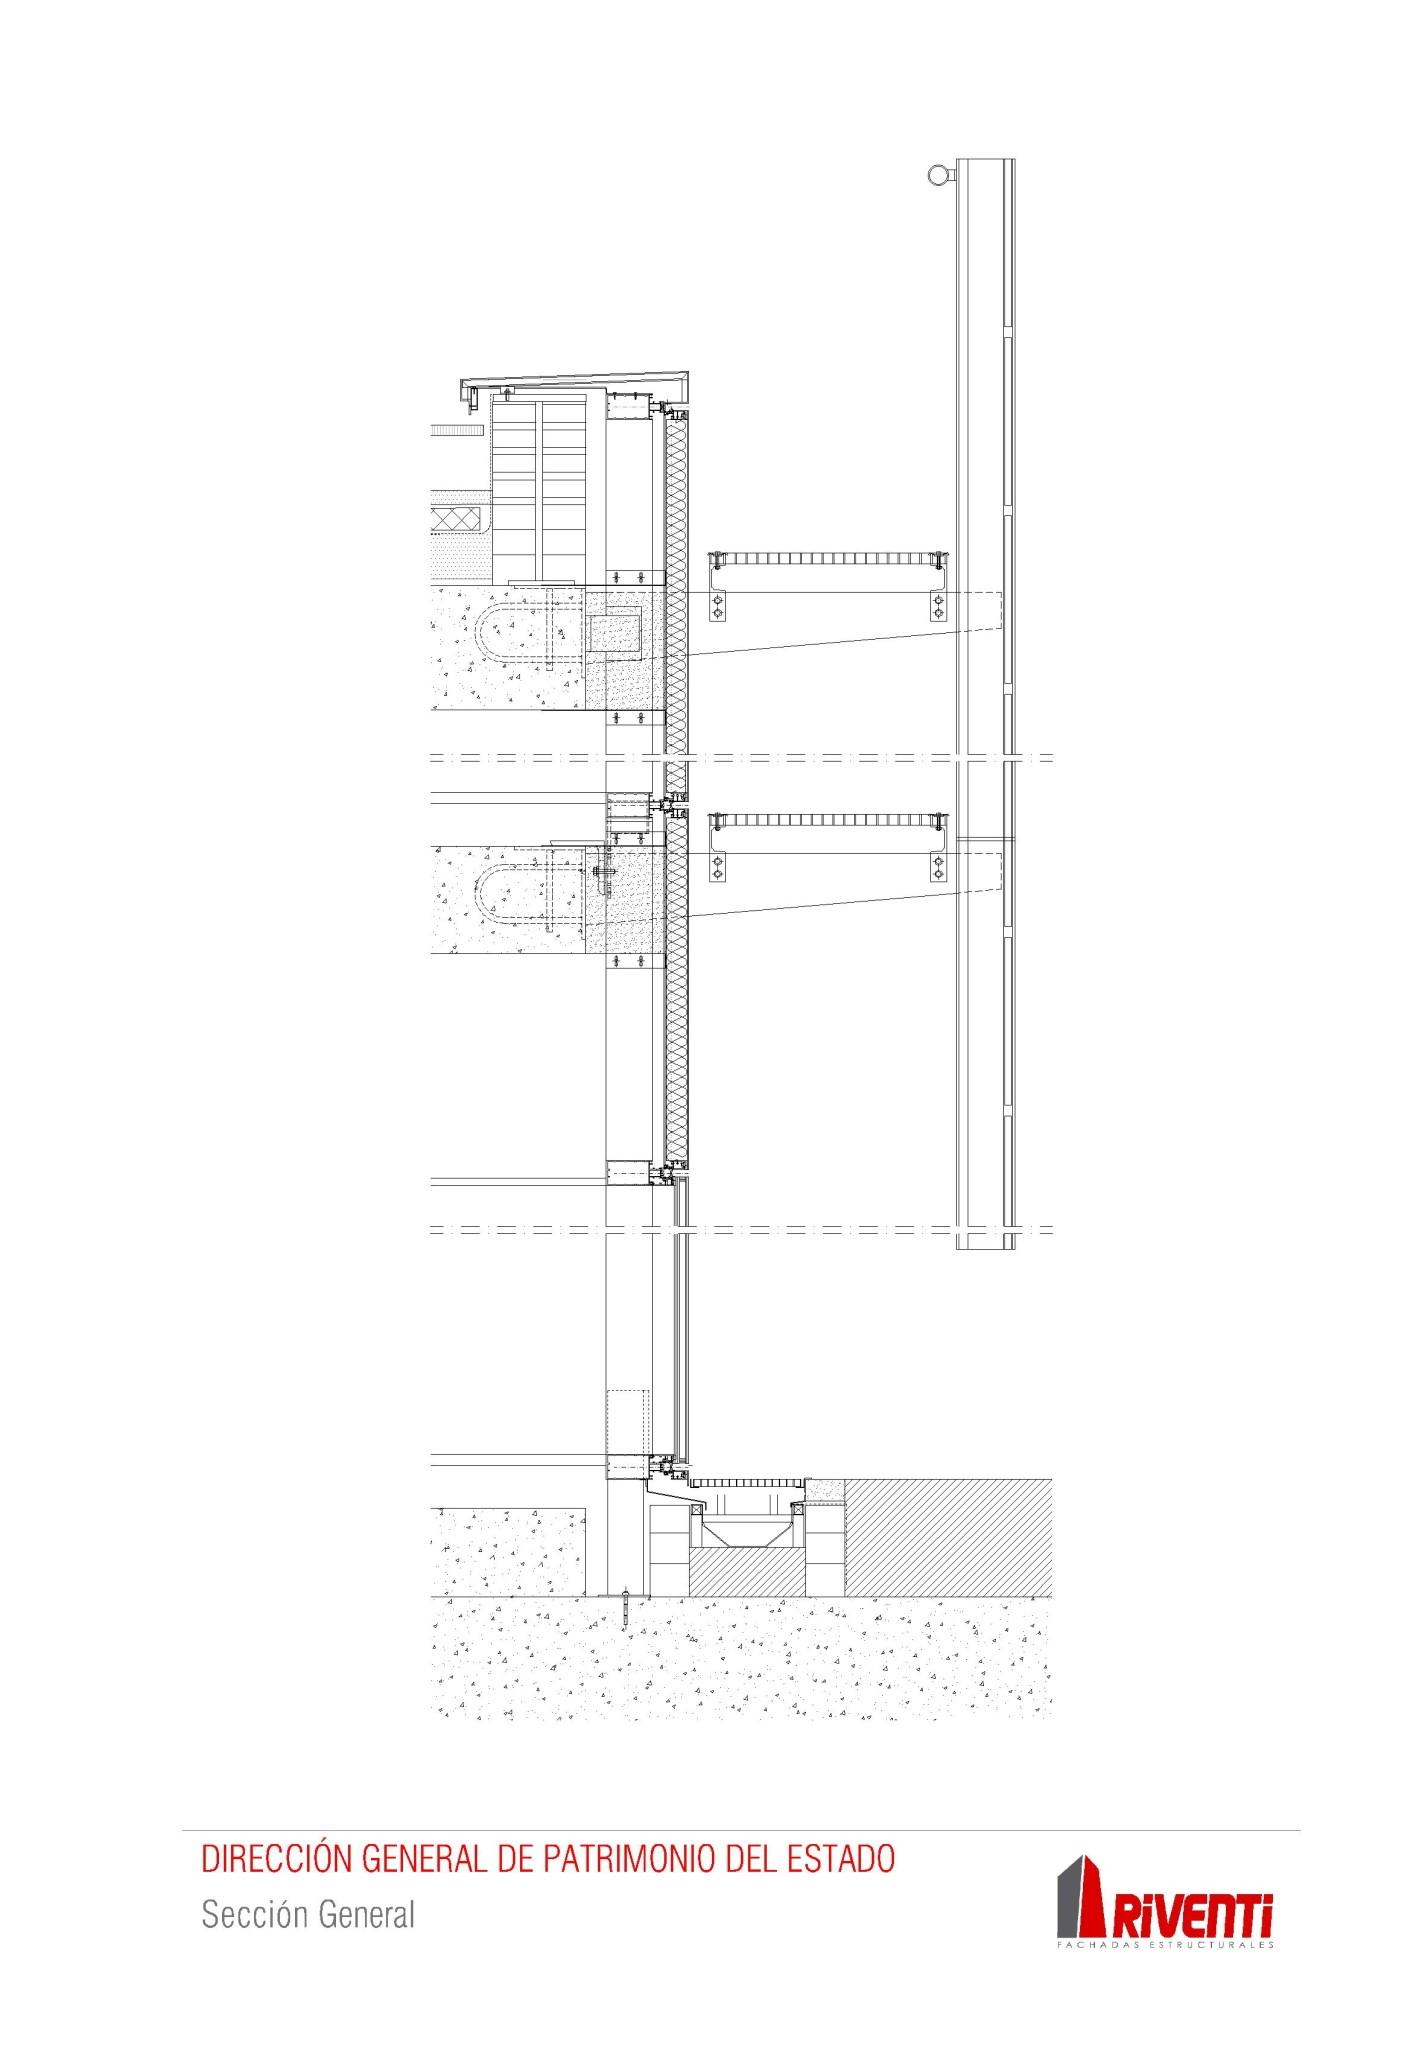 Fachada-doble-piel-muro-cortina-riventi_detalle-constructivo-sección